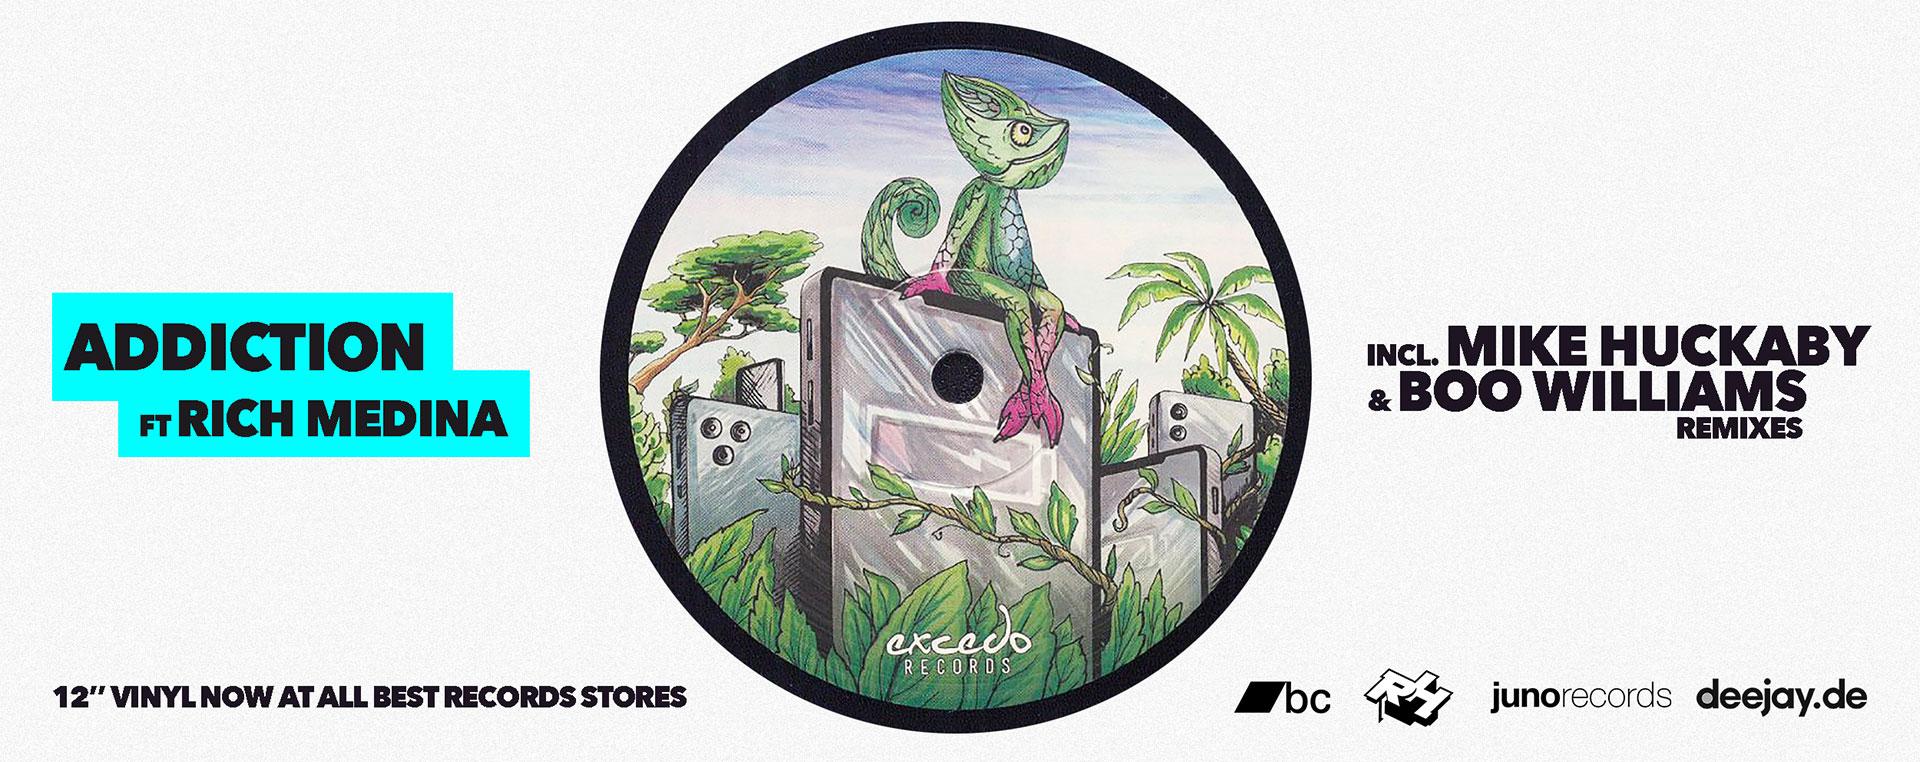 Addiction ft. Rich Medina, incl. Mike Huckaby, Boo Williams Remixes